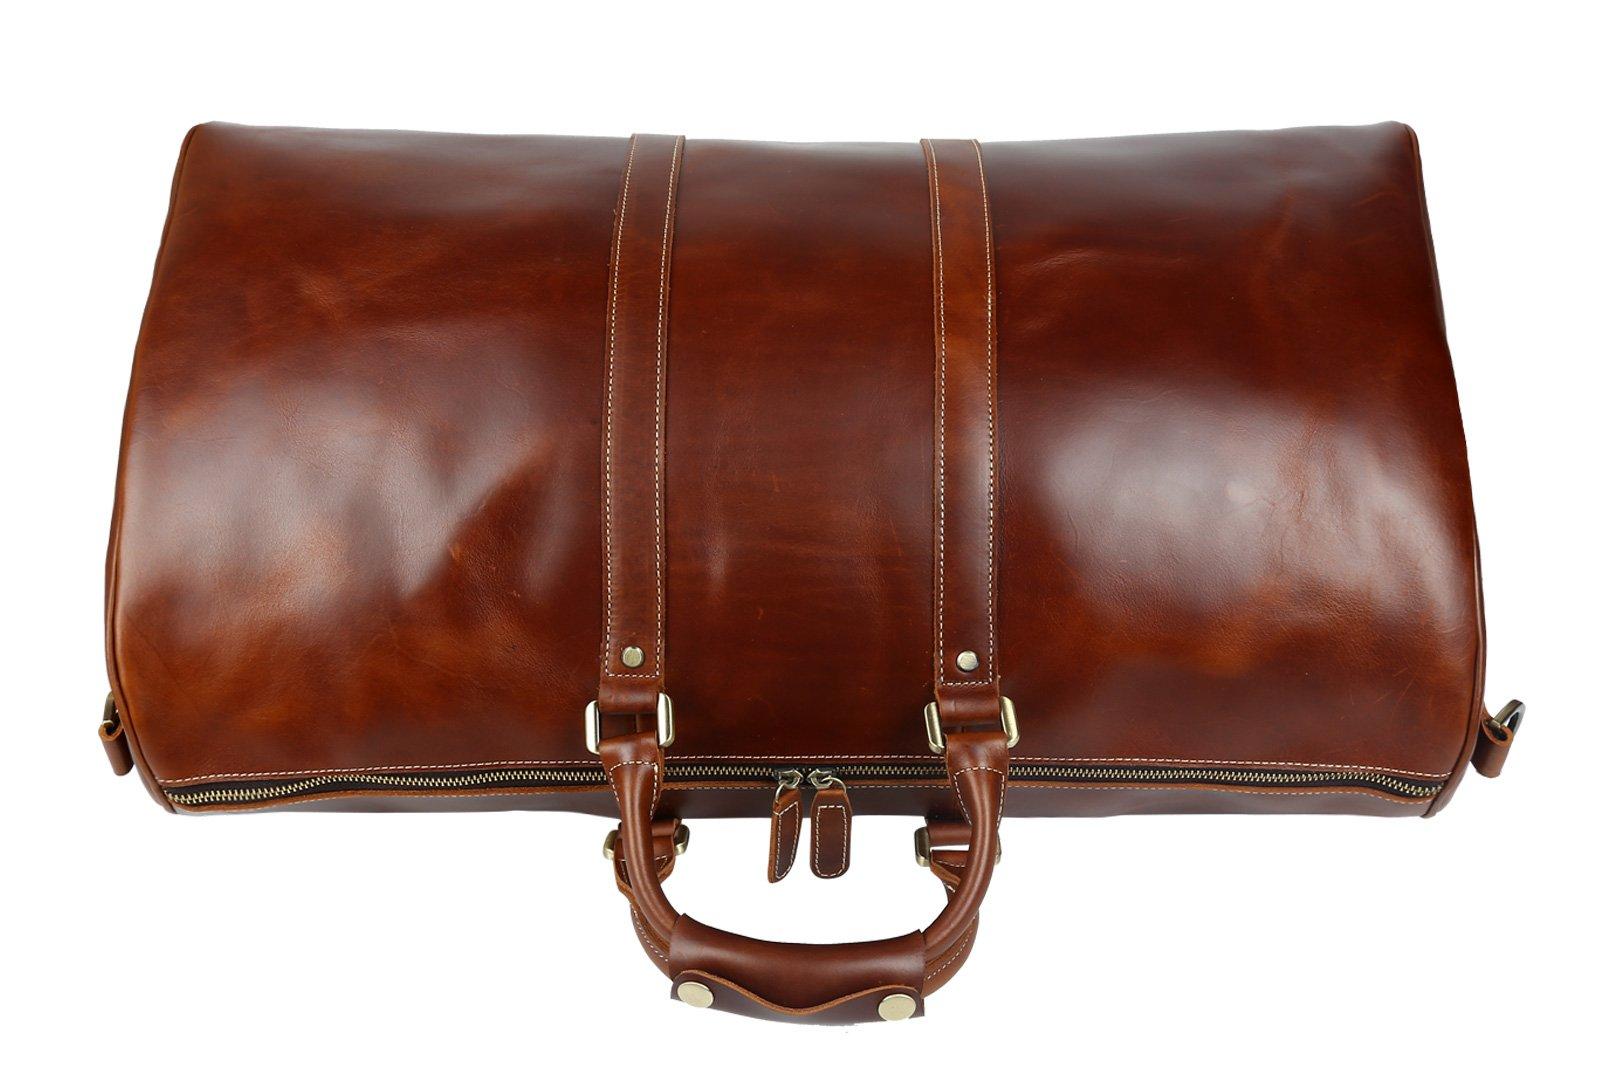 Huntvp Mens Leather Travel Duffel Bag Vintage Weekender Carry On Brown Luggage Bag by Huntvp (Image #4)